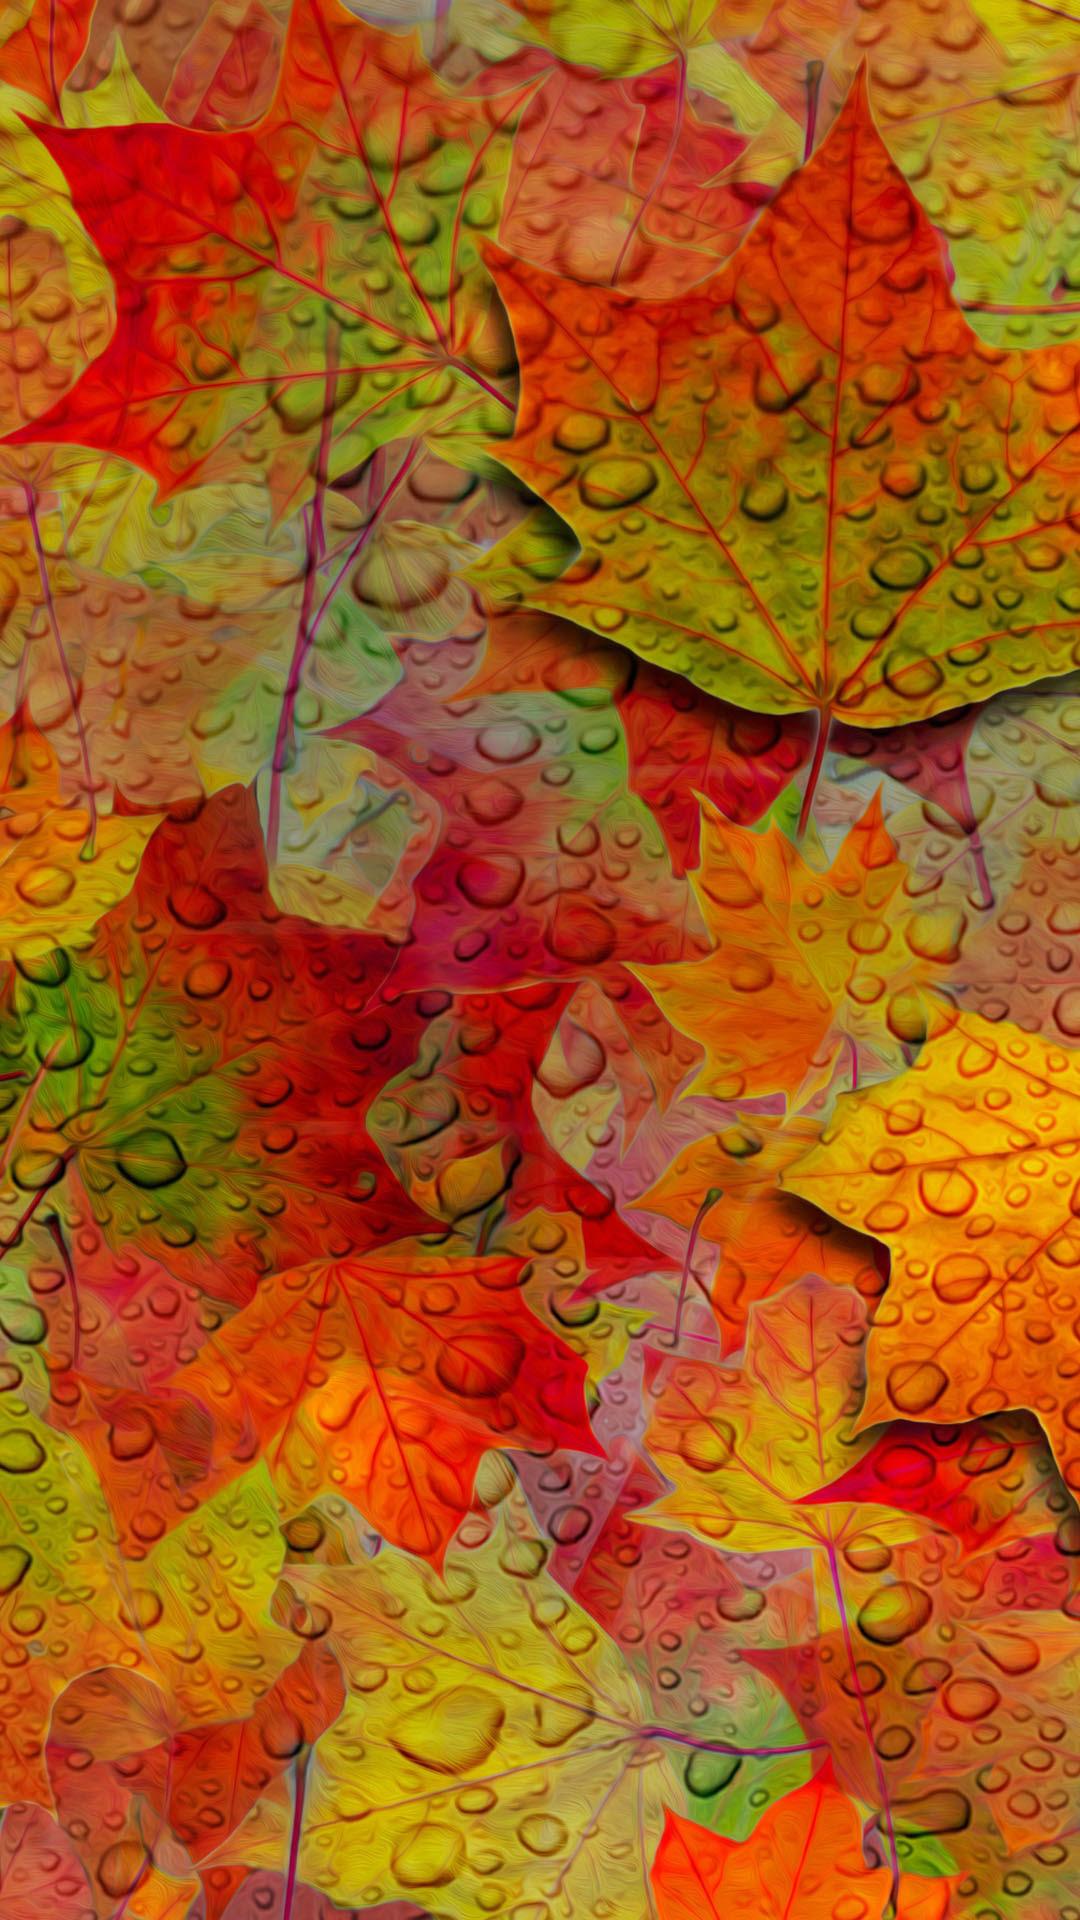 Fall iPhone Wallpapers   PixelsTalk.Net